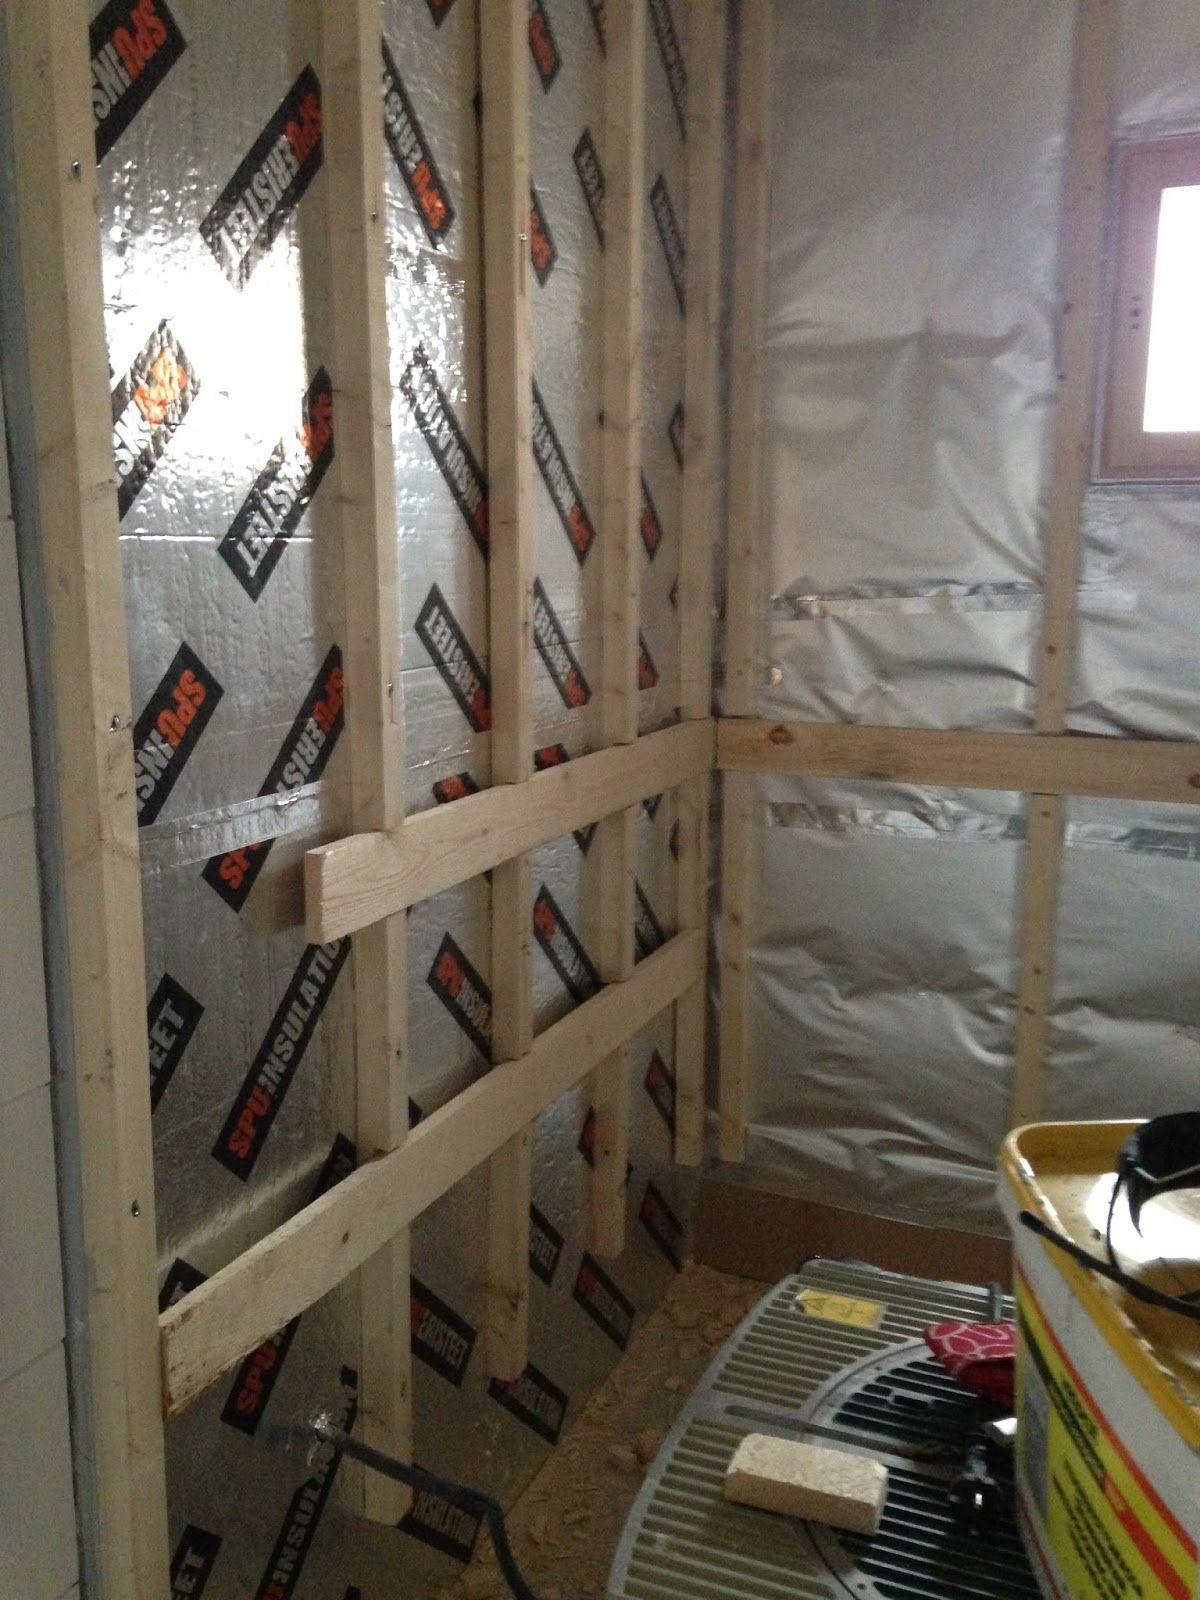 sauna wand aufbau in finnland mit spu dämmplatten | sauna